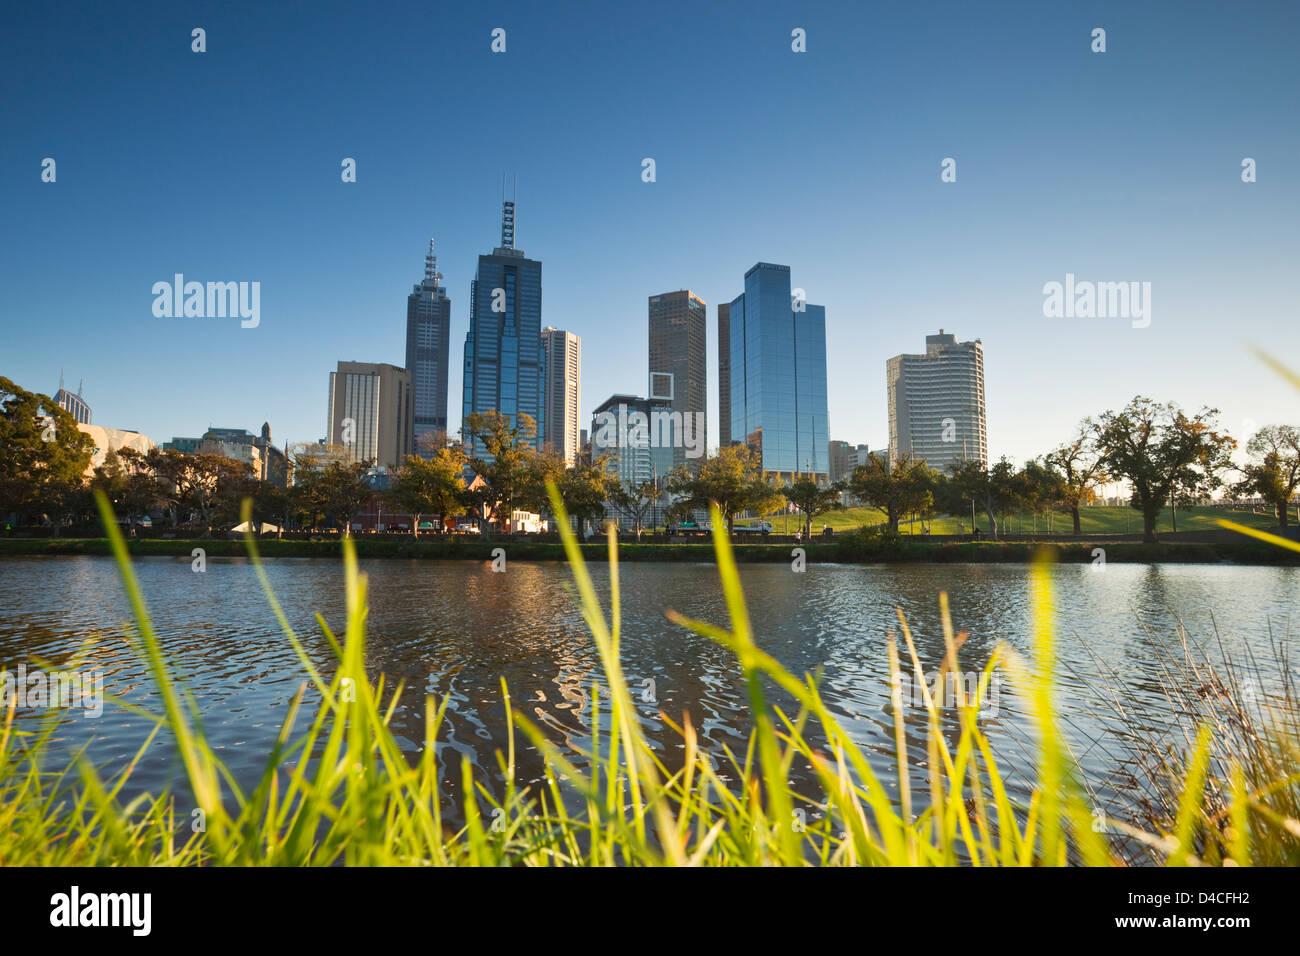 View across Yarra River to city skyline at dawn. Melbourne, Victoria, Australia Stock Photo